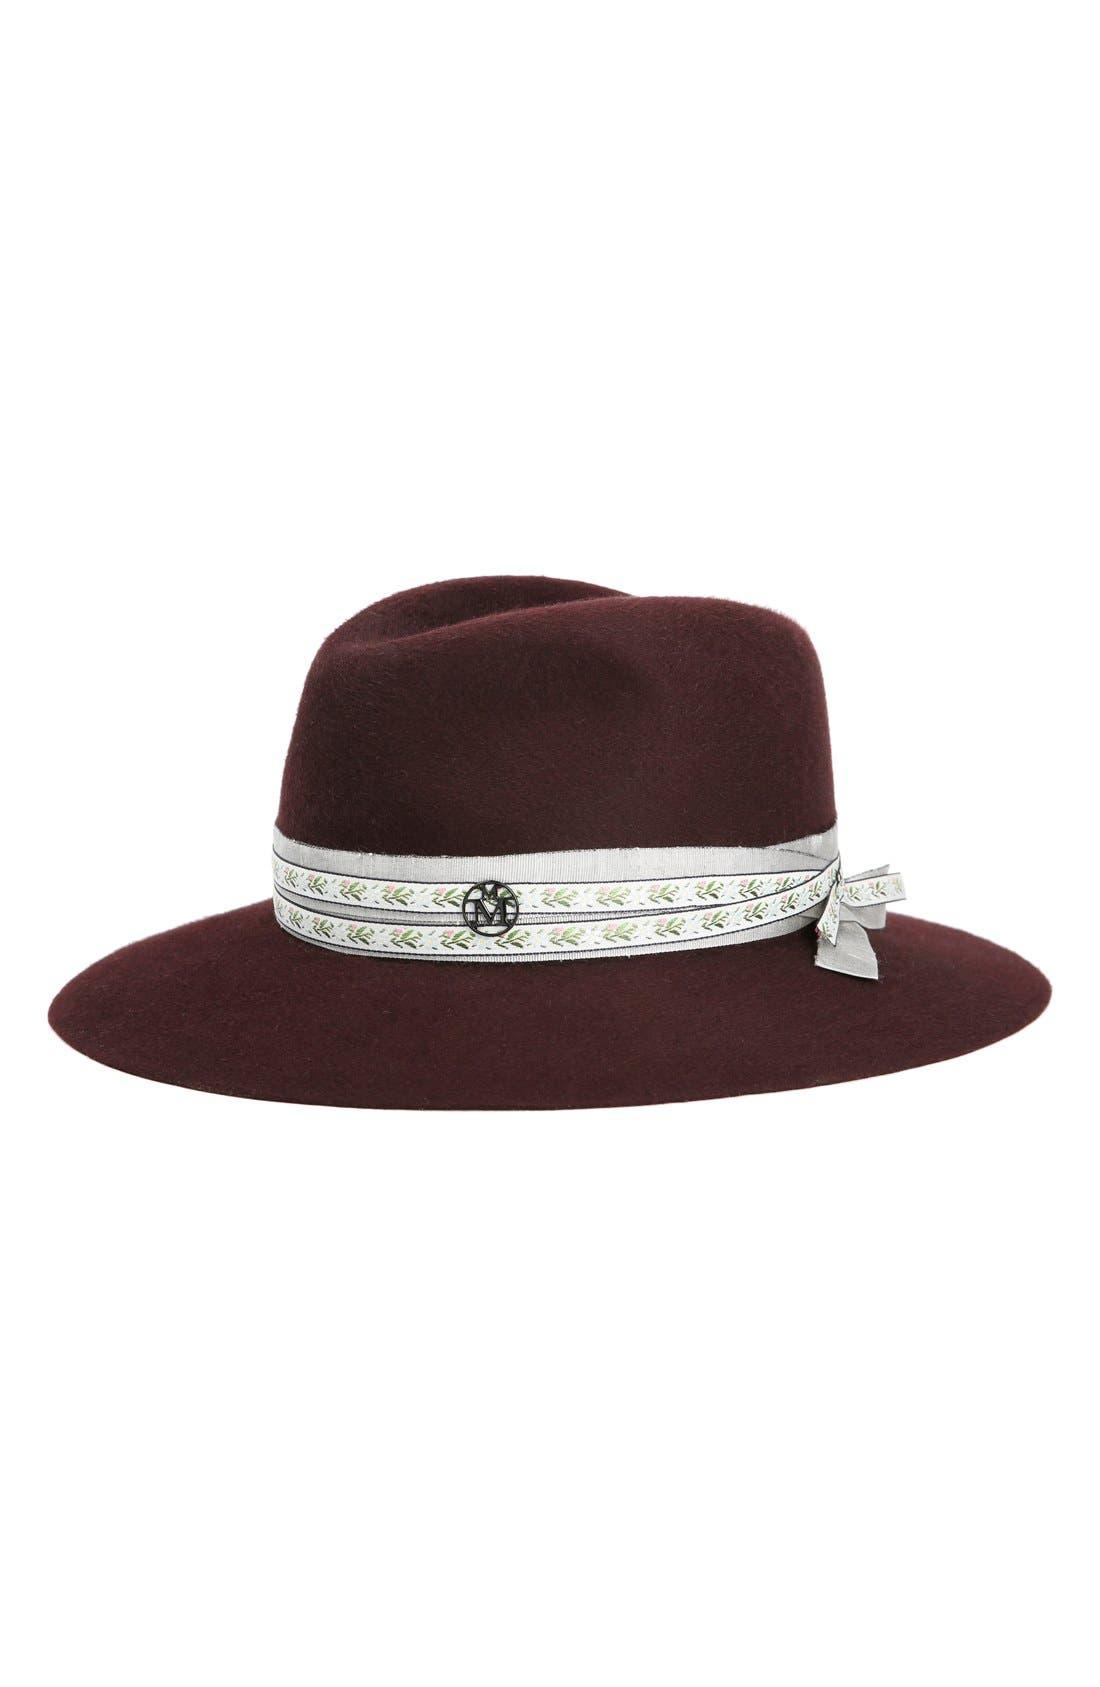 Maison Michel Henrietta Fur Felt Hat